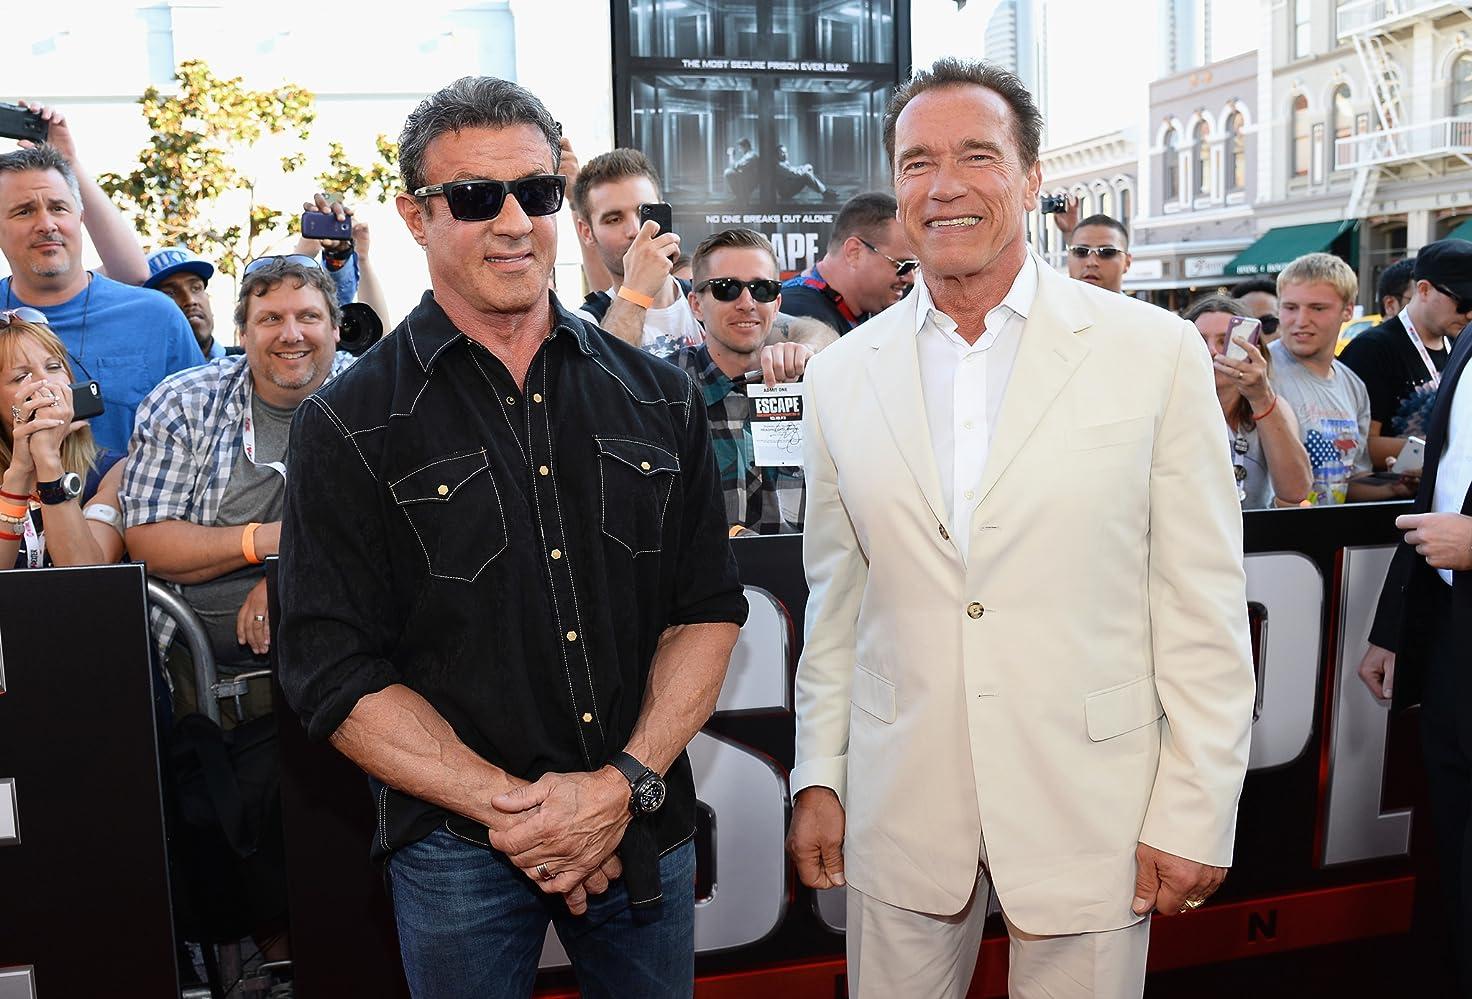 Sylvester Stallone And Arnold Schwarzenegger In Hospital